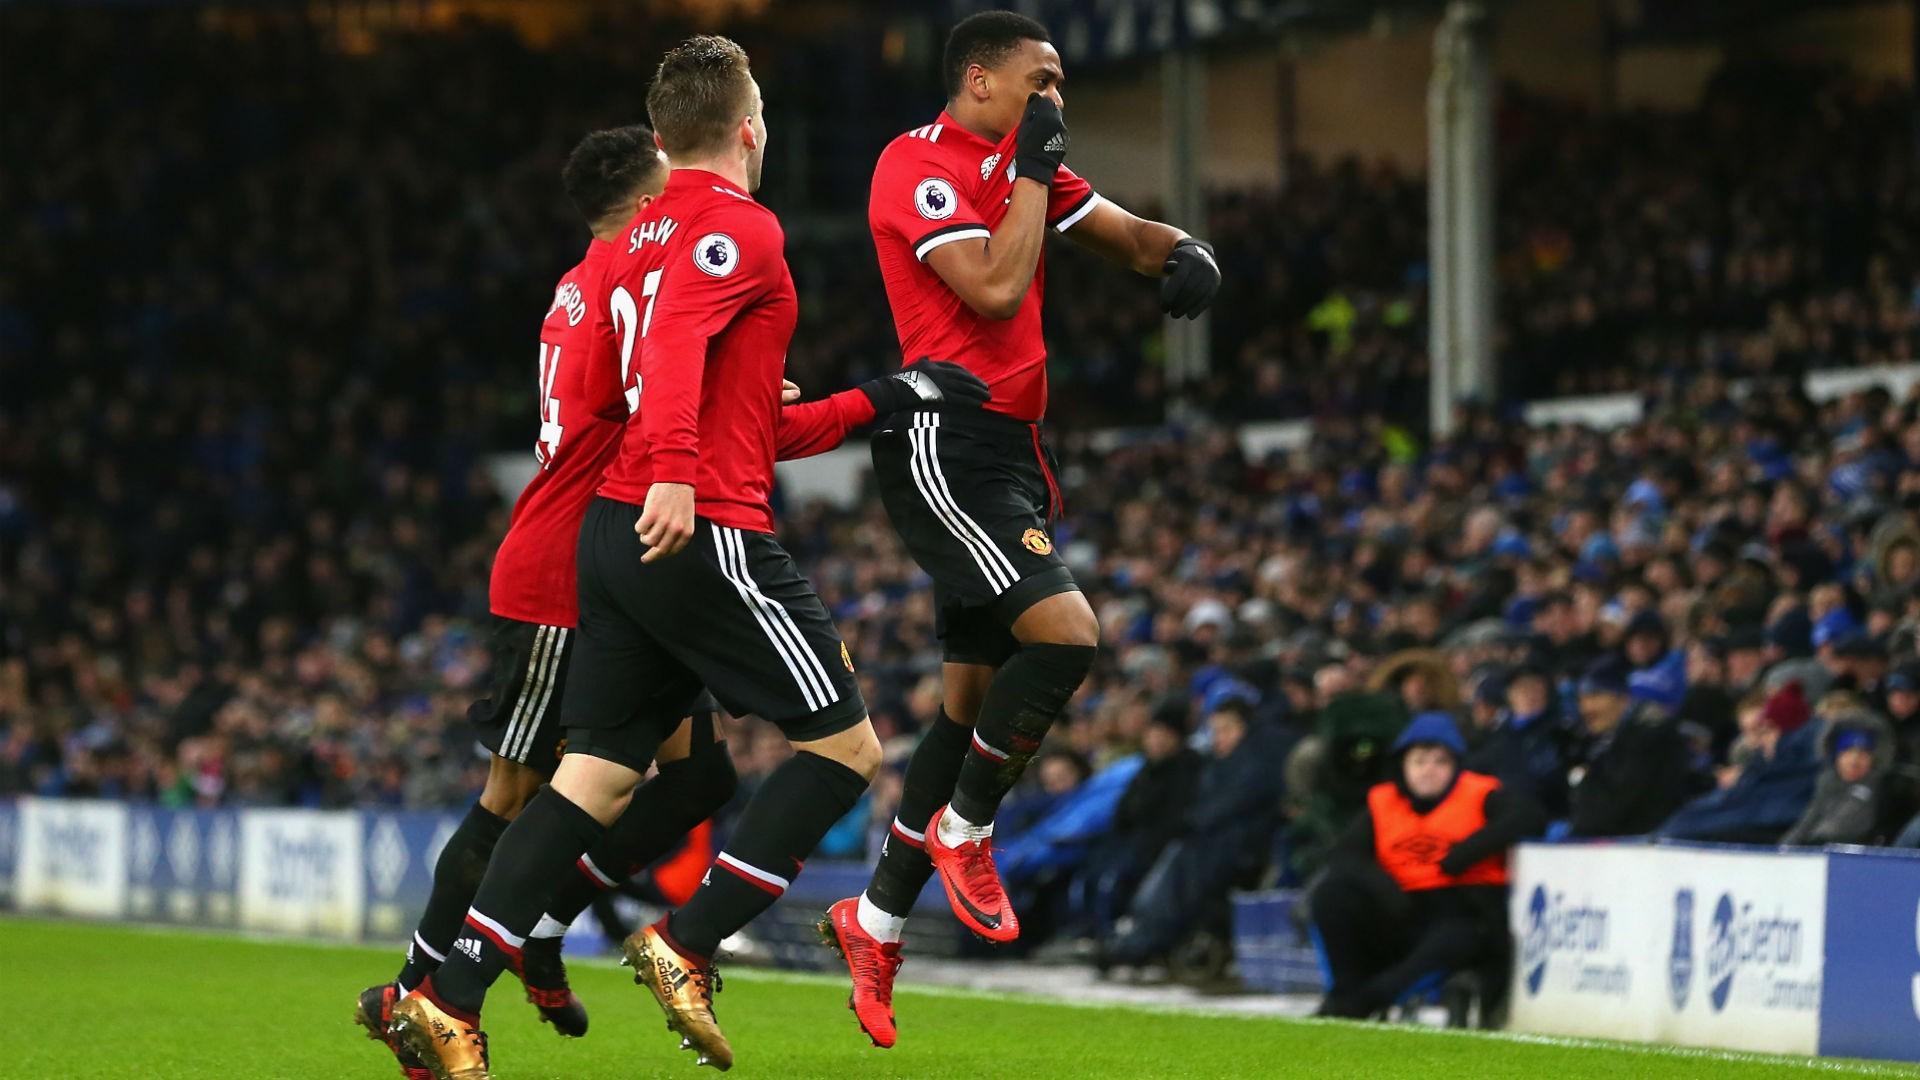 Download Everton 0-2 Manchester United (Premier League) Highlights